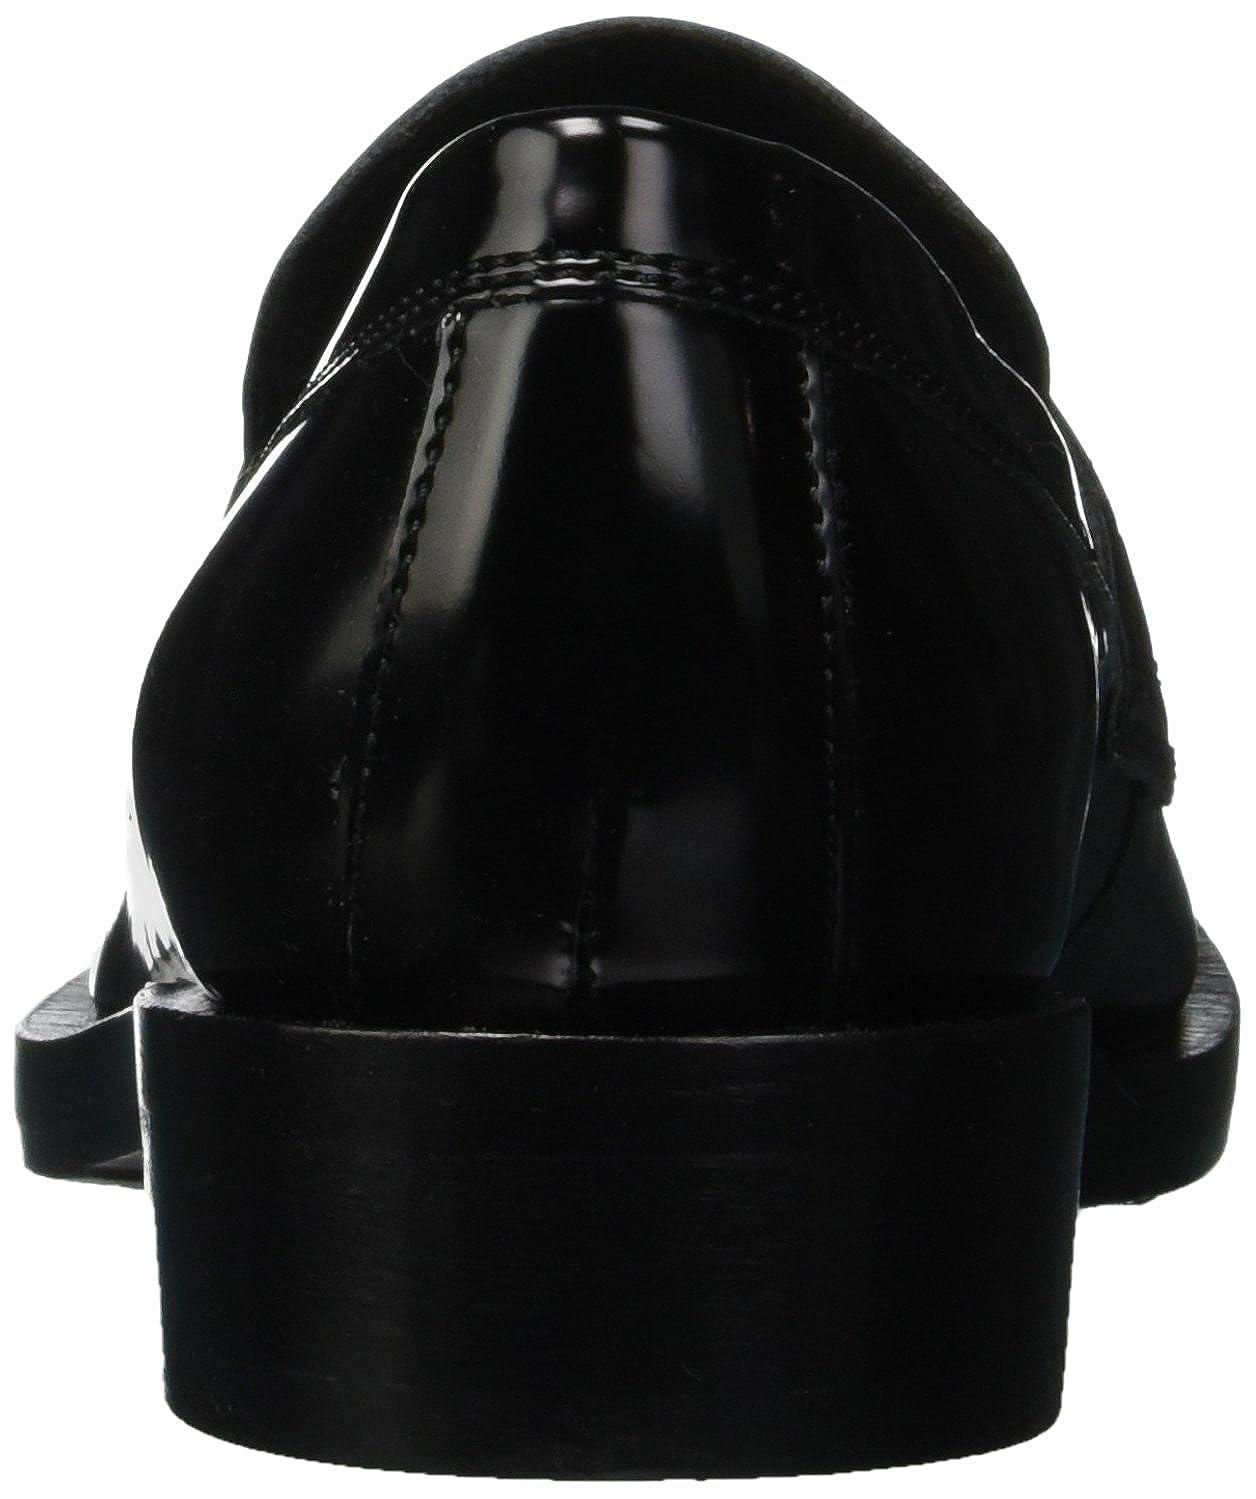 Geox Slipper Damen Damenschuhe Brogue A Slipper Geox Schwarz (schwarz/Bordeaux C0241) 5bcfd8